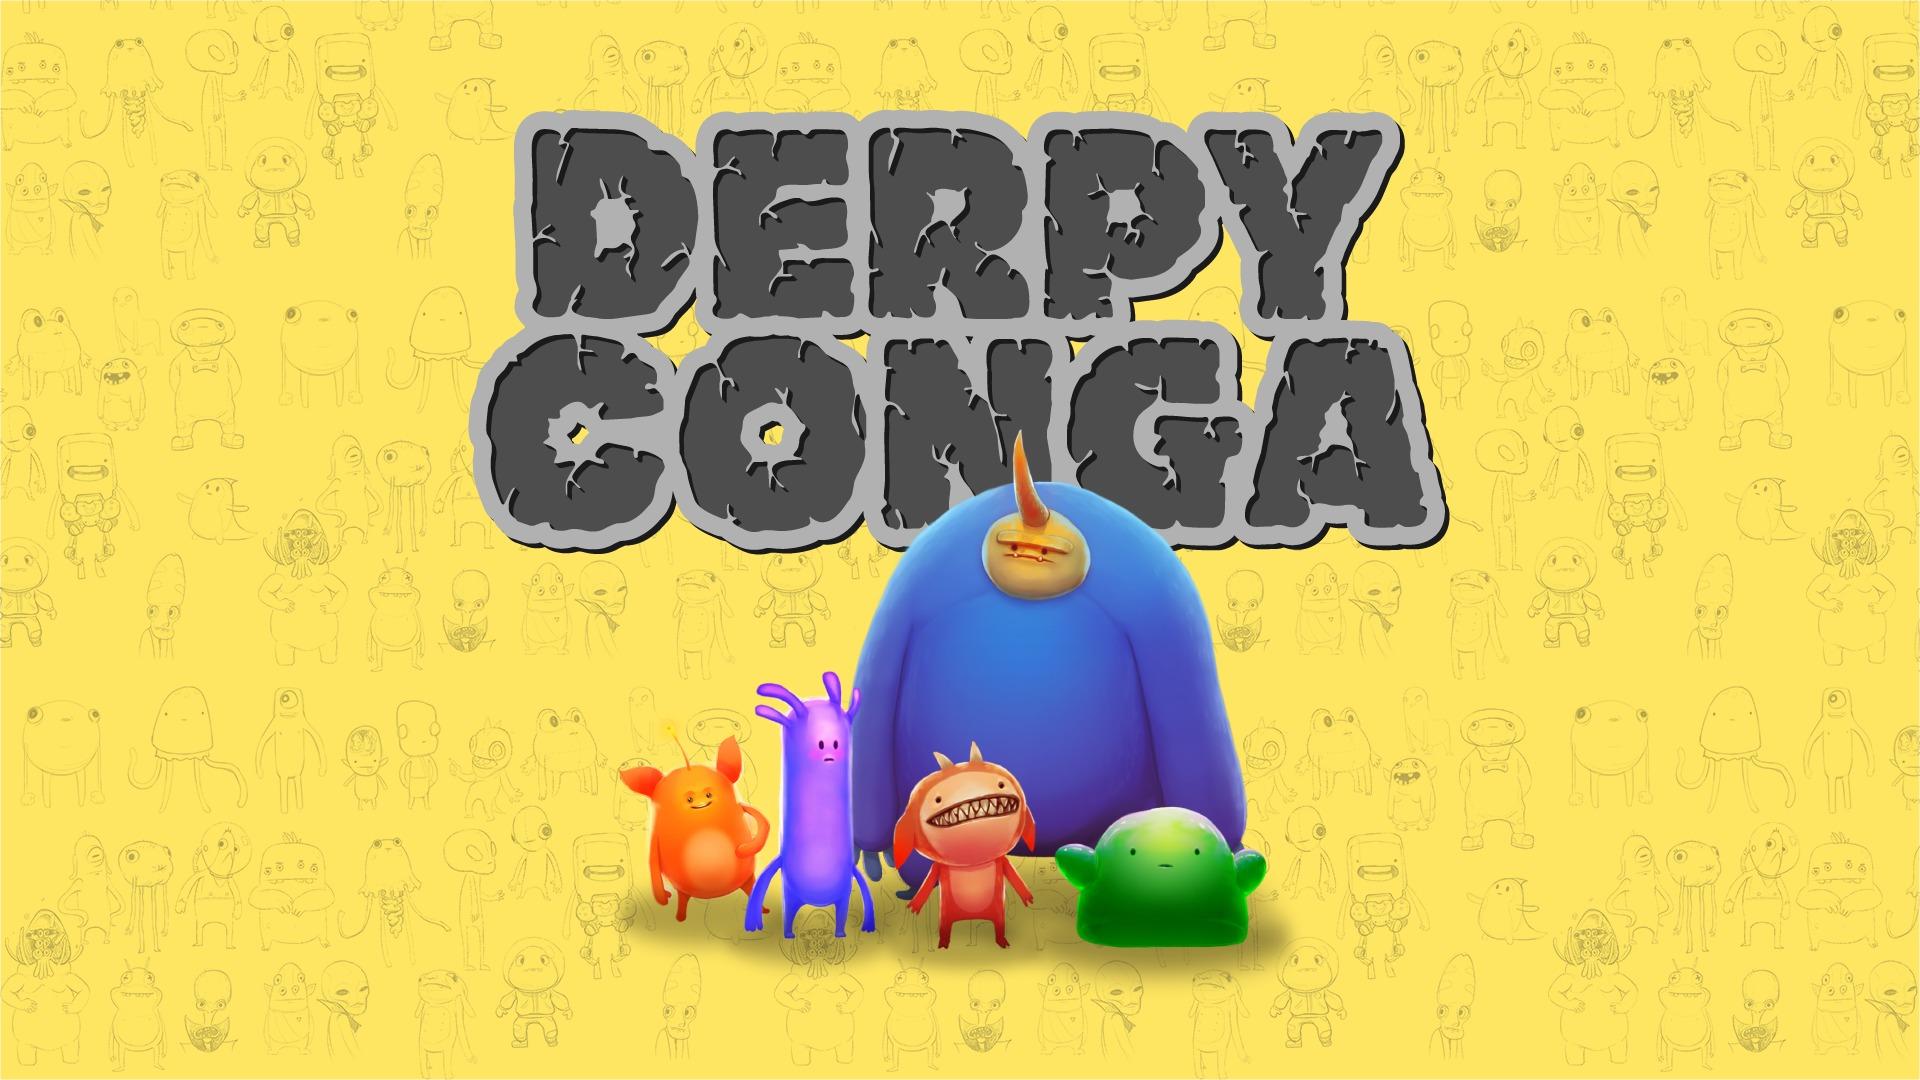 DerpyConga